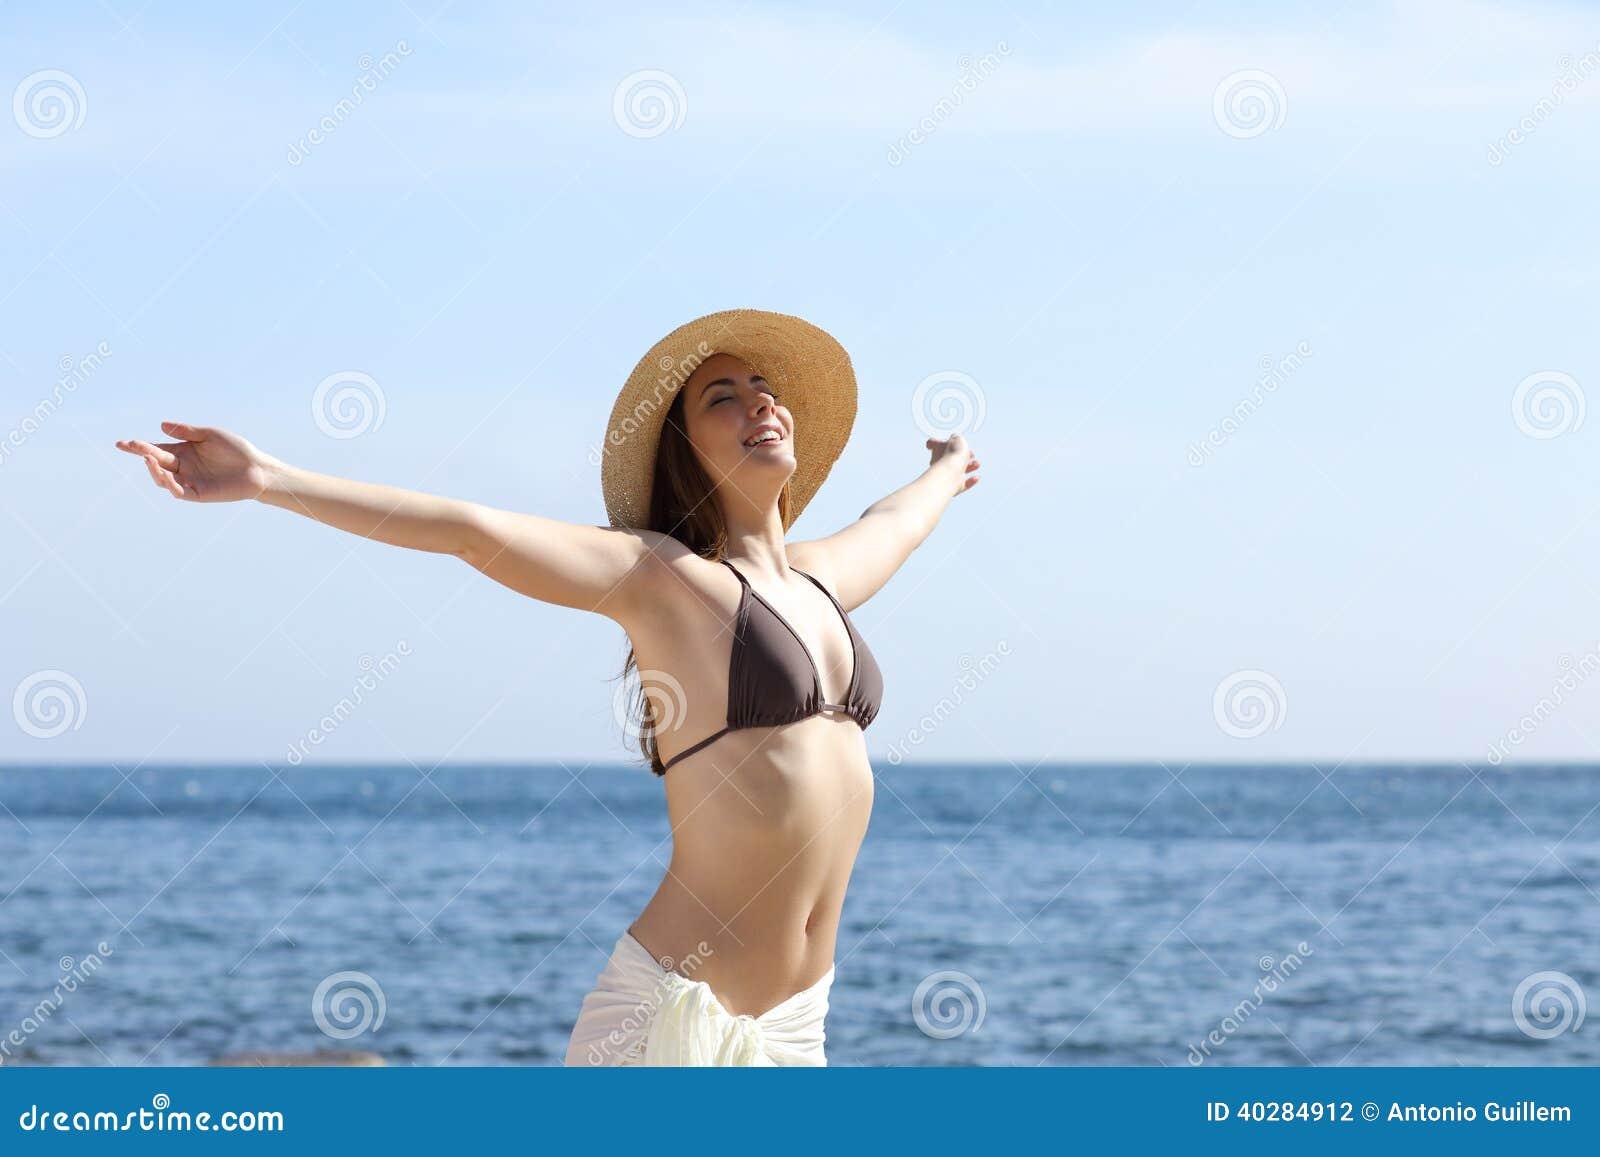 Happy Woman Breathing Fresh Air On The Beach Raising Arms